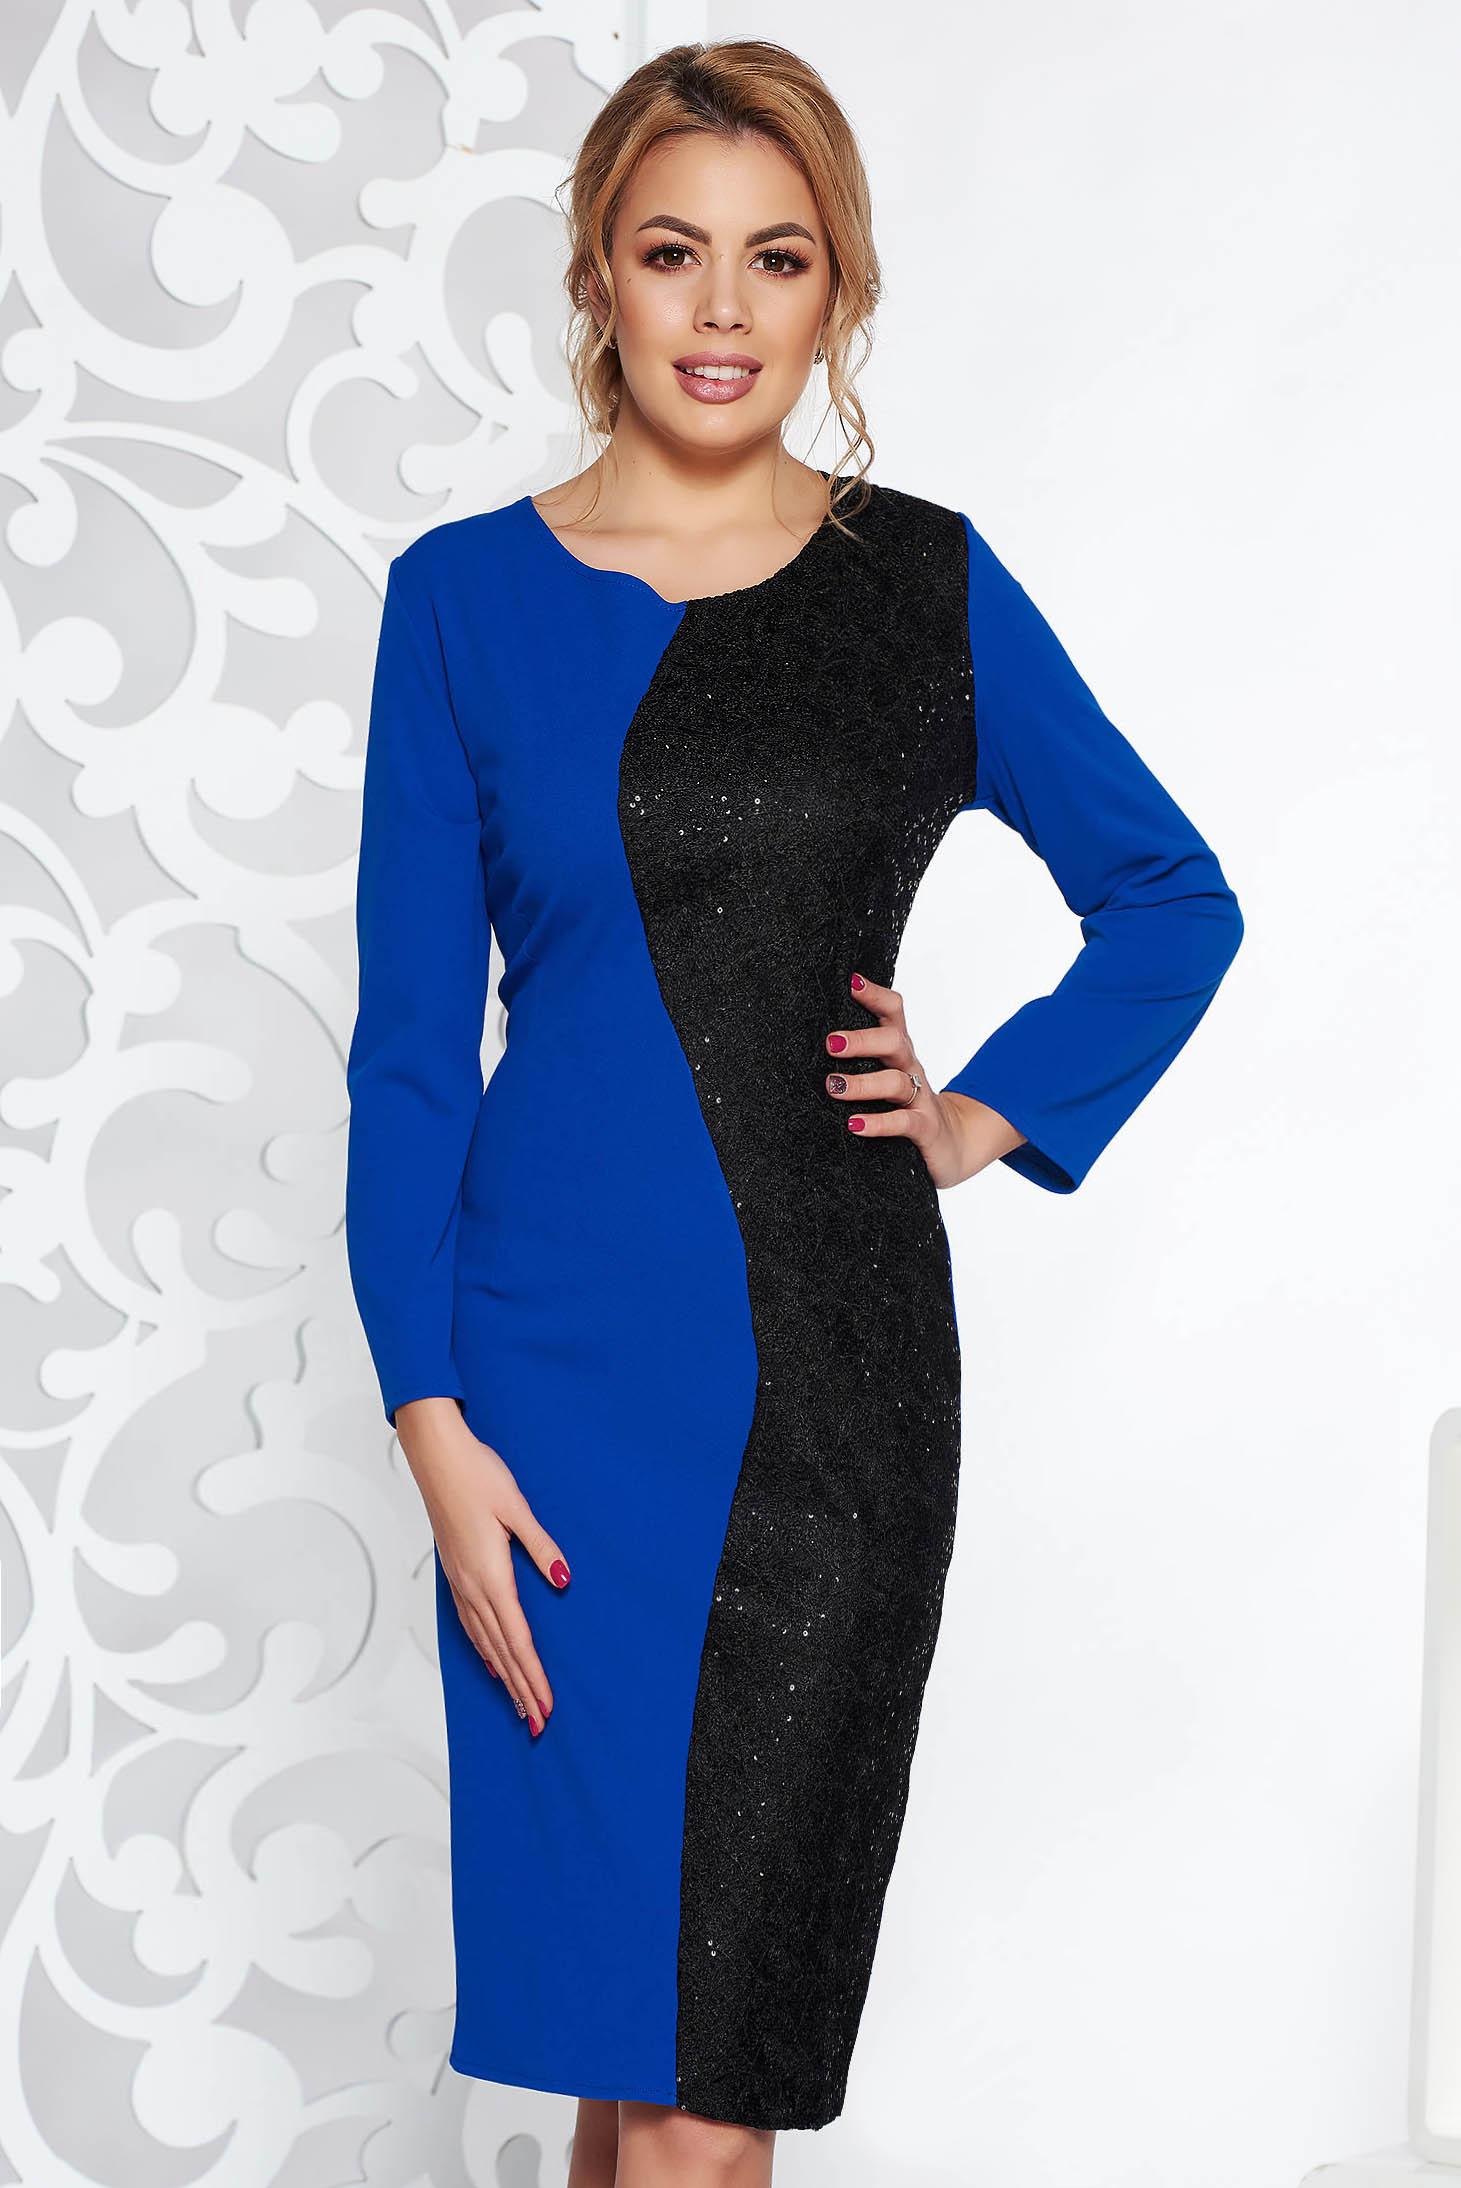 Rochie albastra eleganta midi din material usor elastic cu aplicatii cu paiete